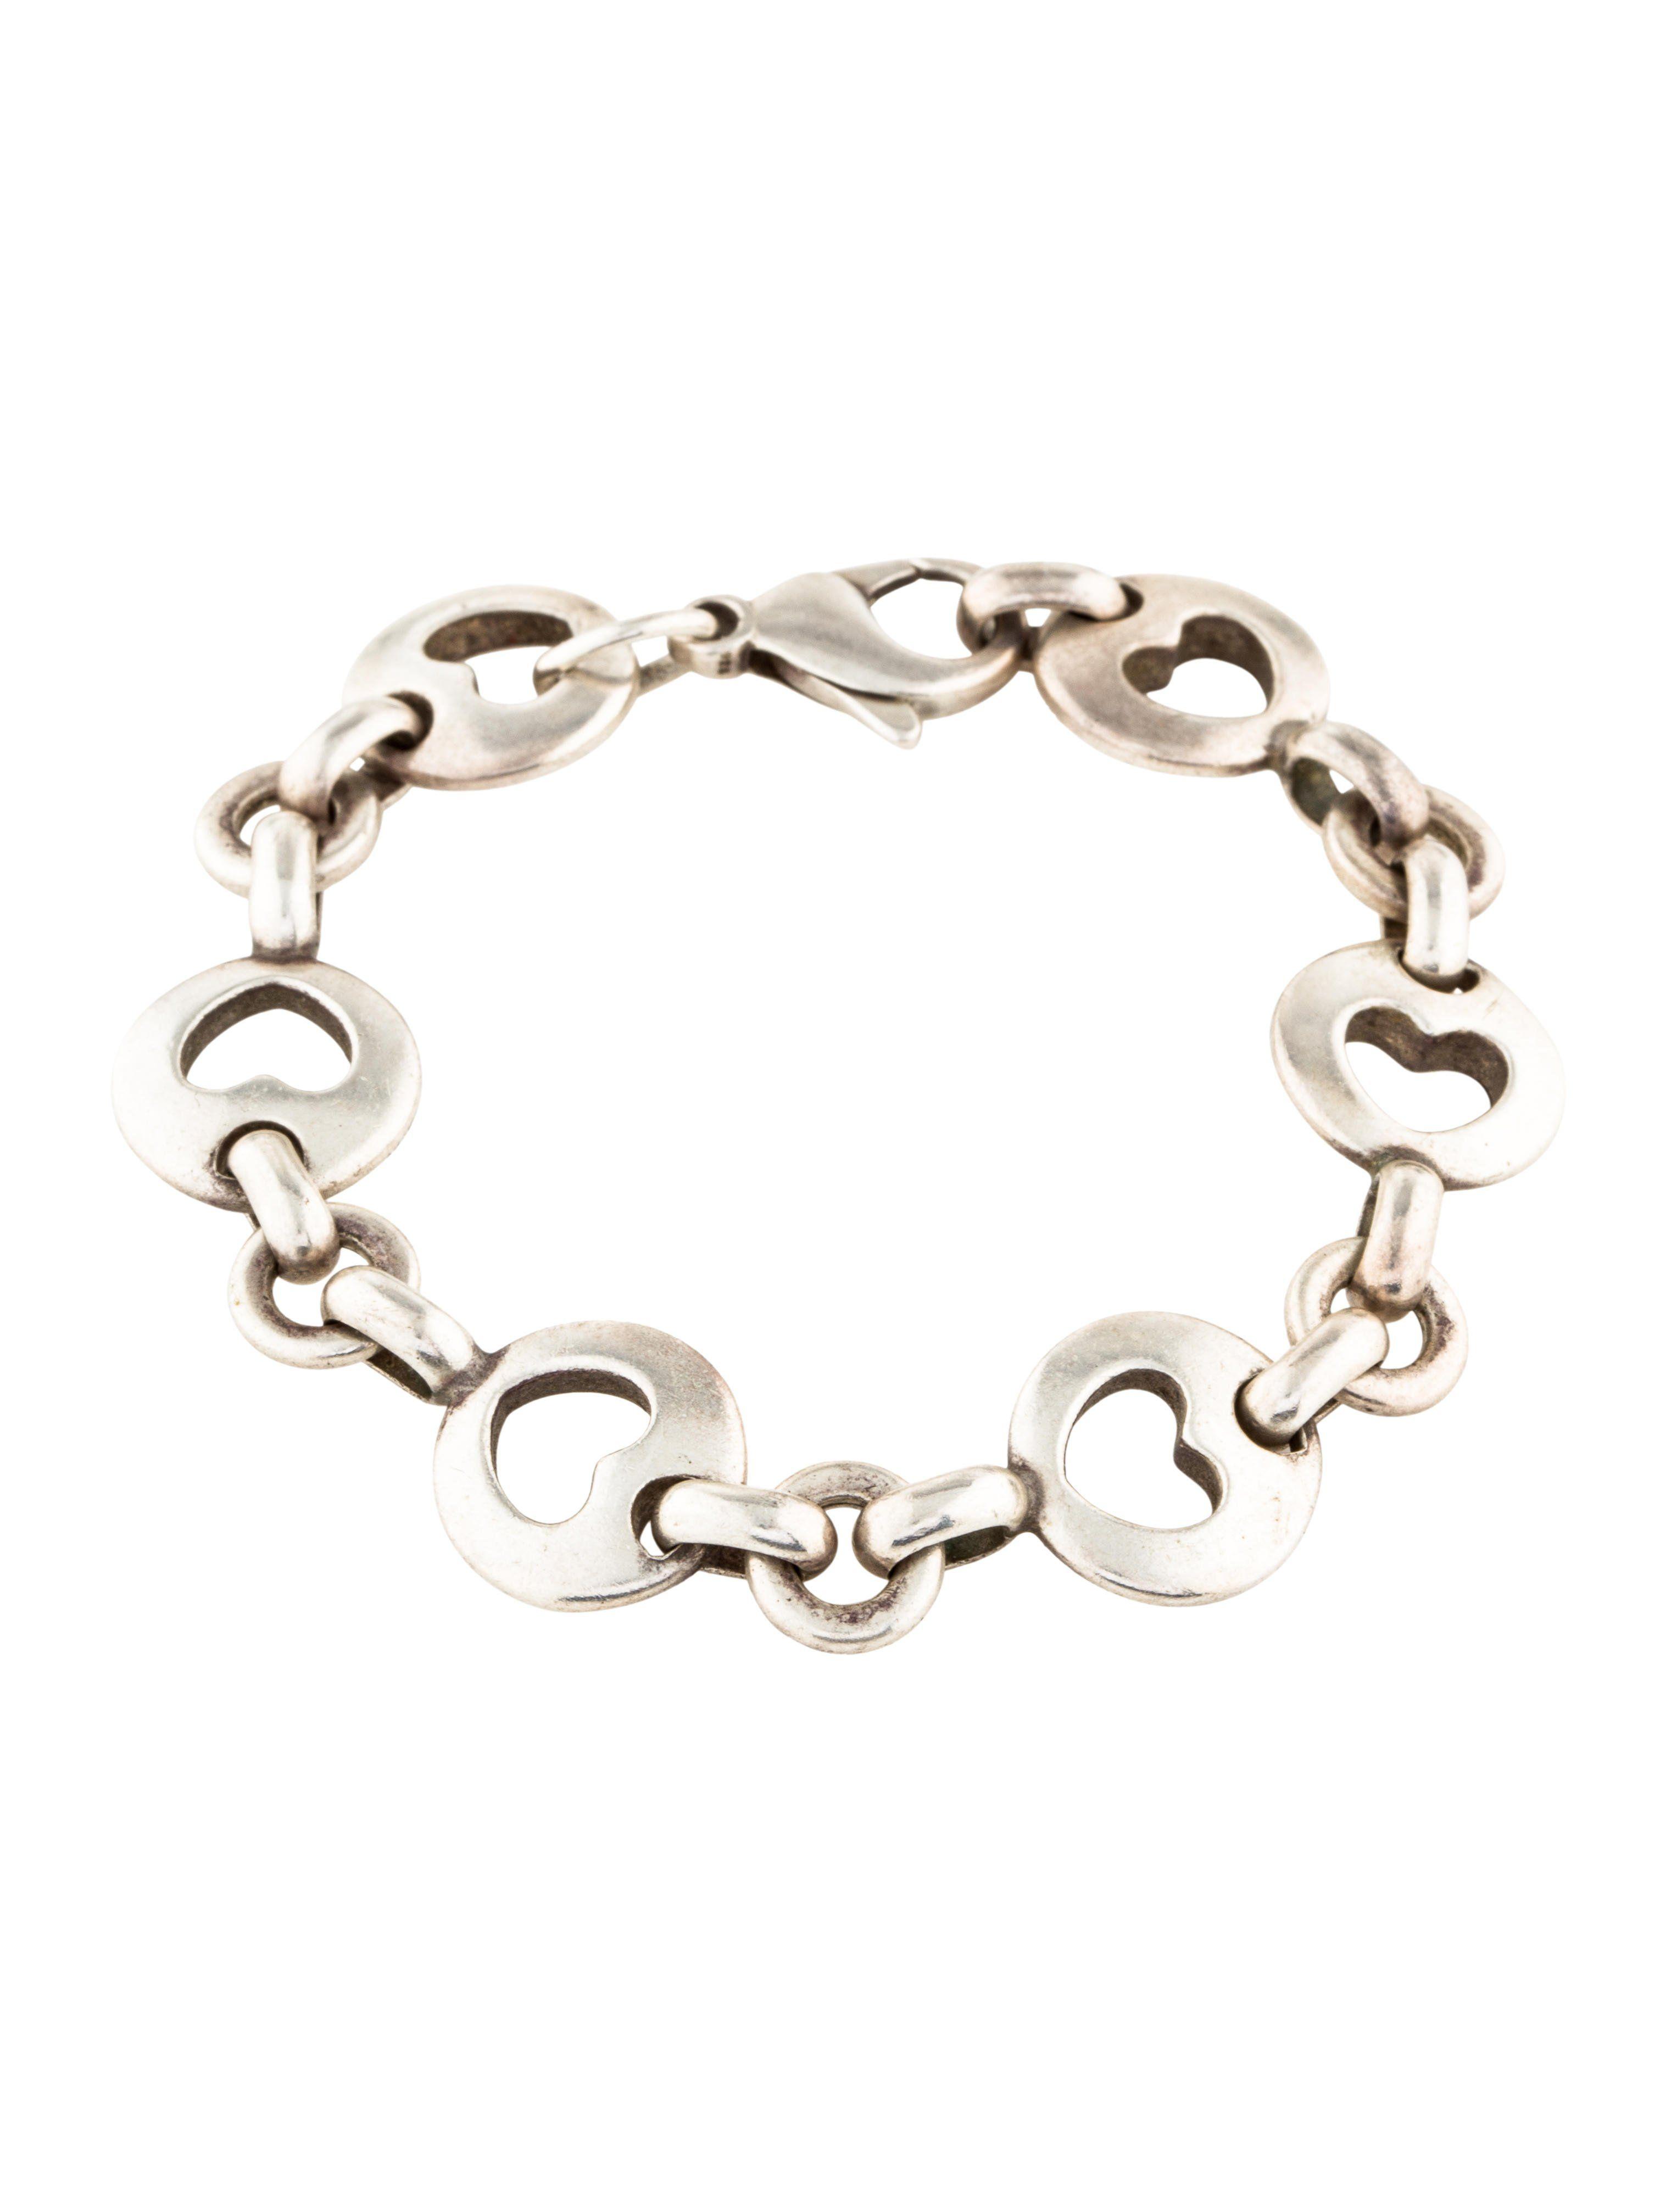 ecfcb4a77168c Stencil Heart Bracelet | fashion | Bracelets, Heart bracelet ...